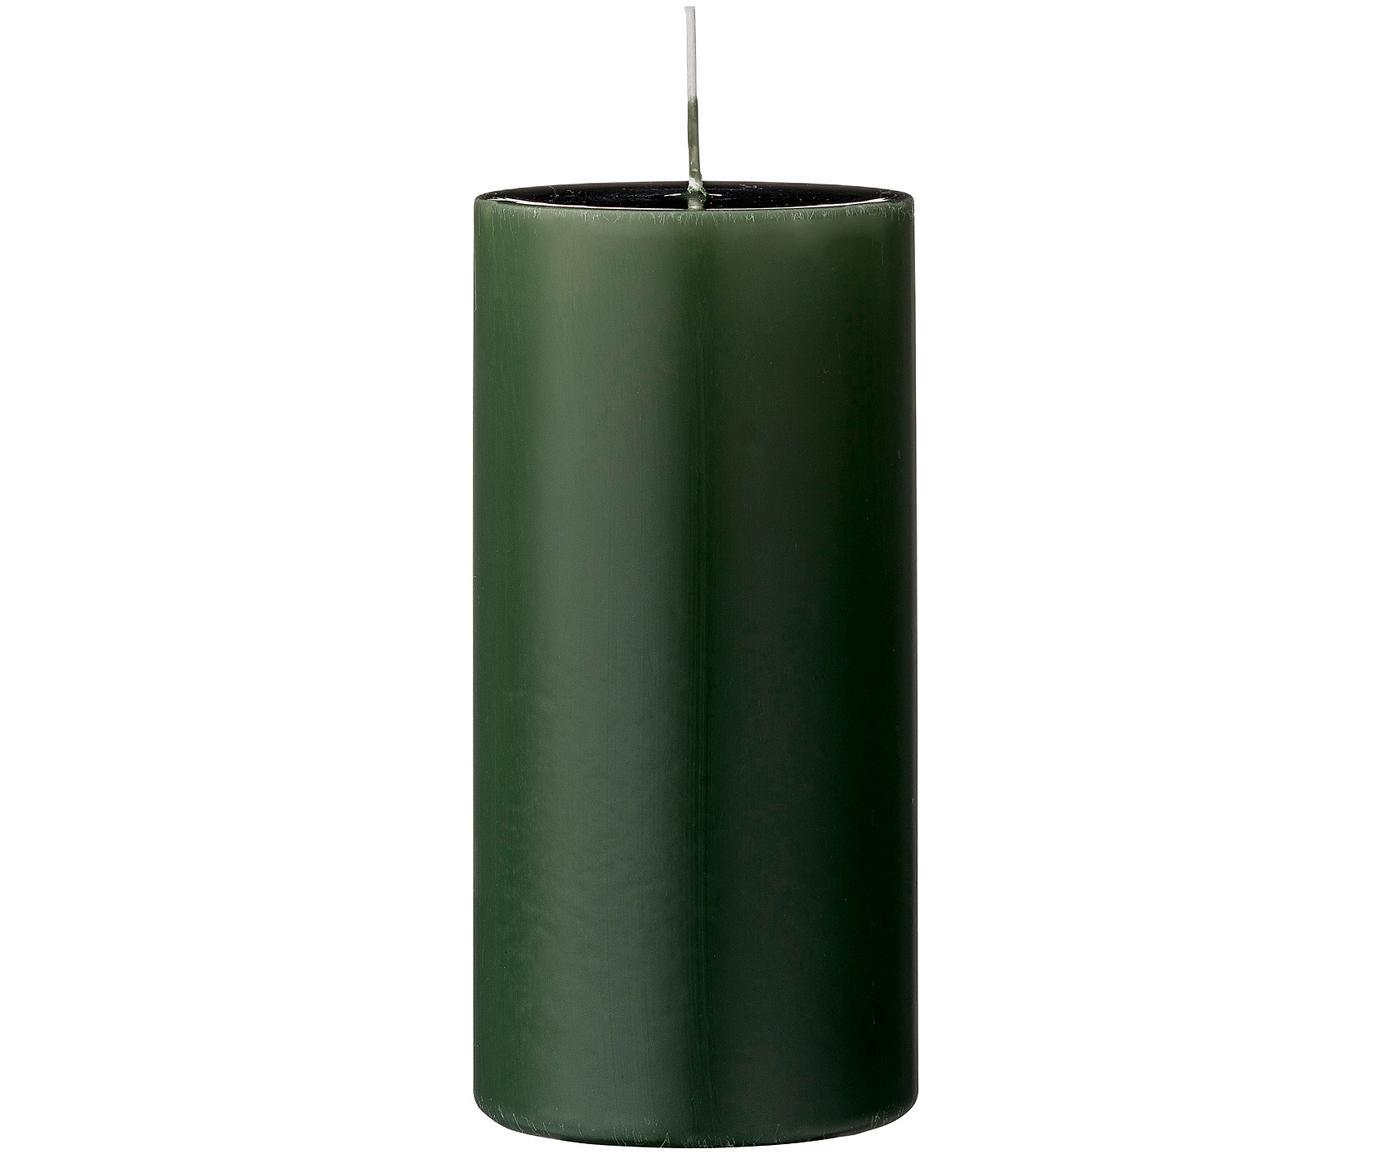 Stompkaarsen Lulu, 2 stuks, Was, Bosgroen, Ø 7 cm